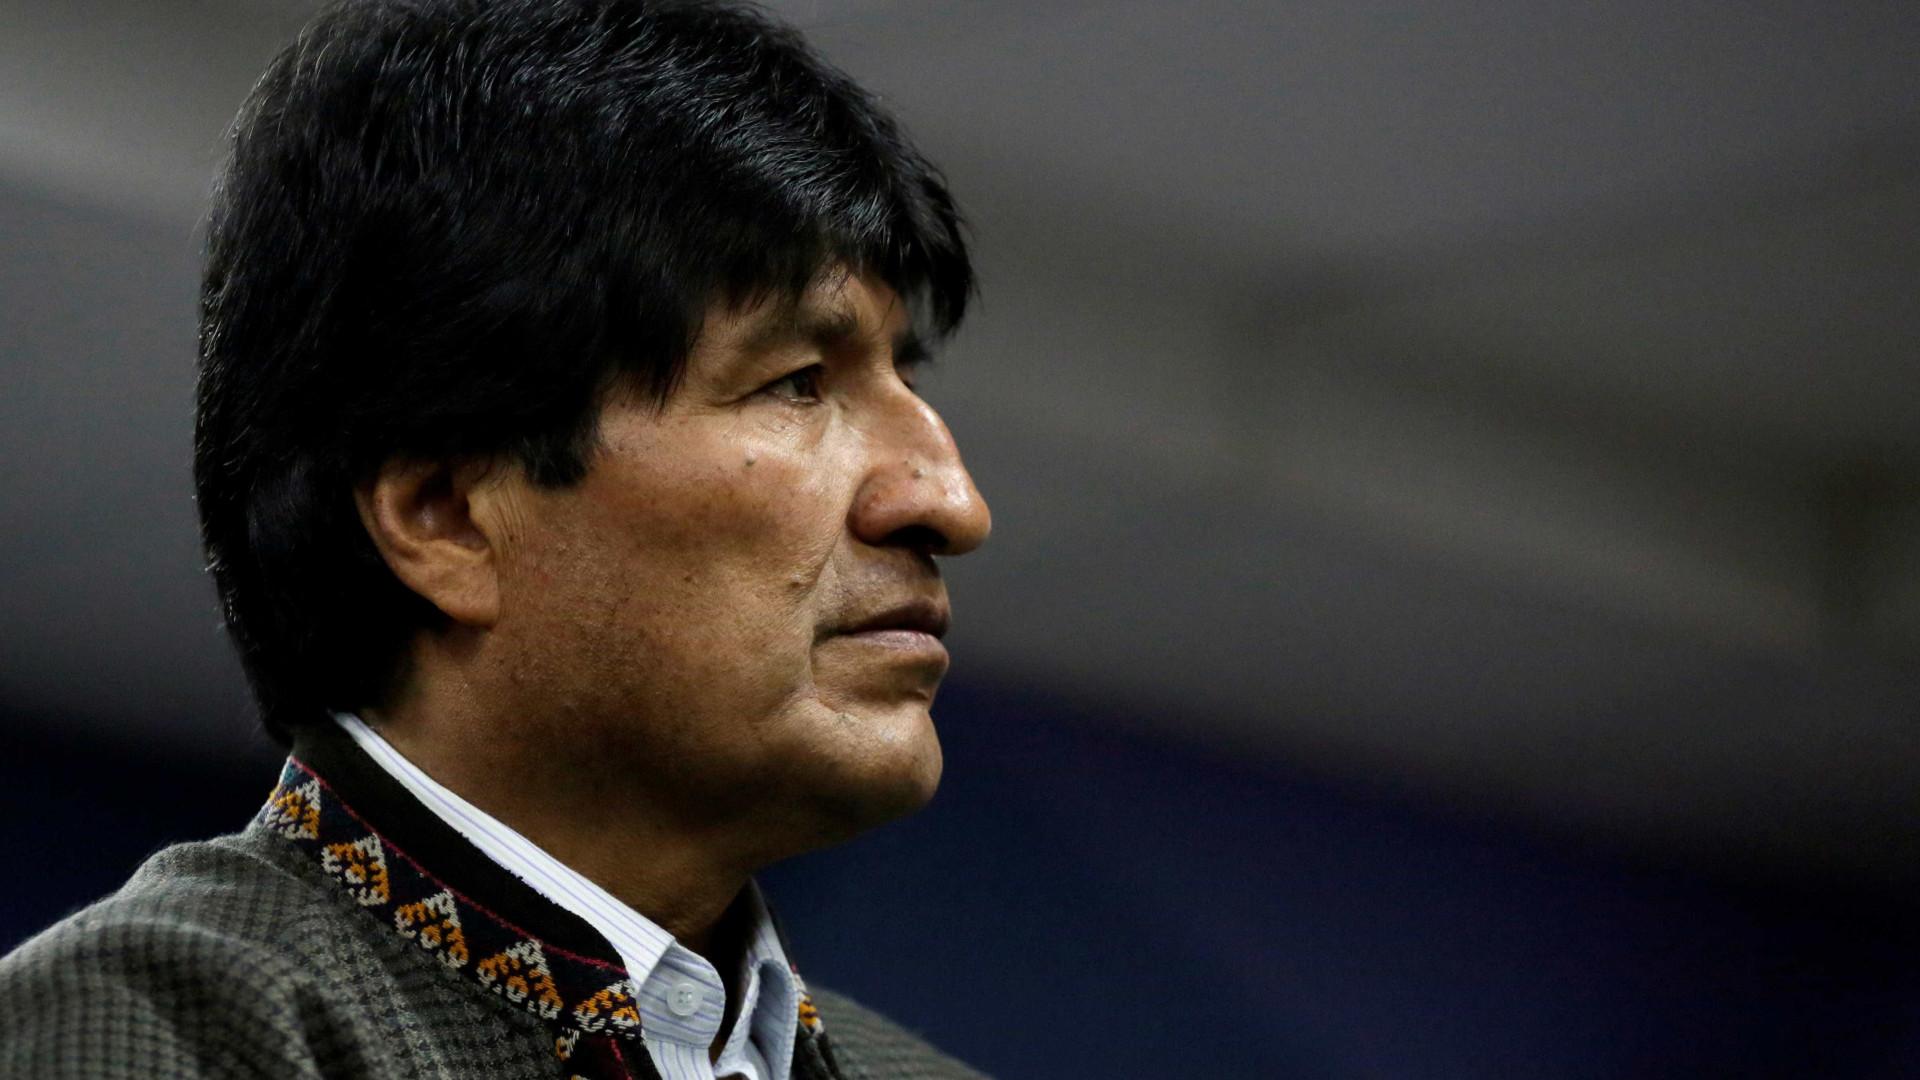 Presidente boliviano expressa condolências a famílias de vítimas